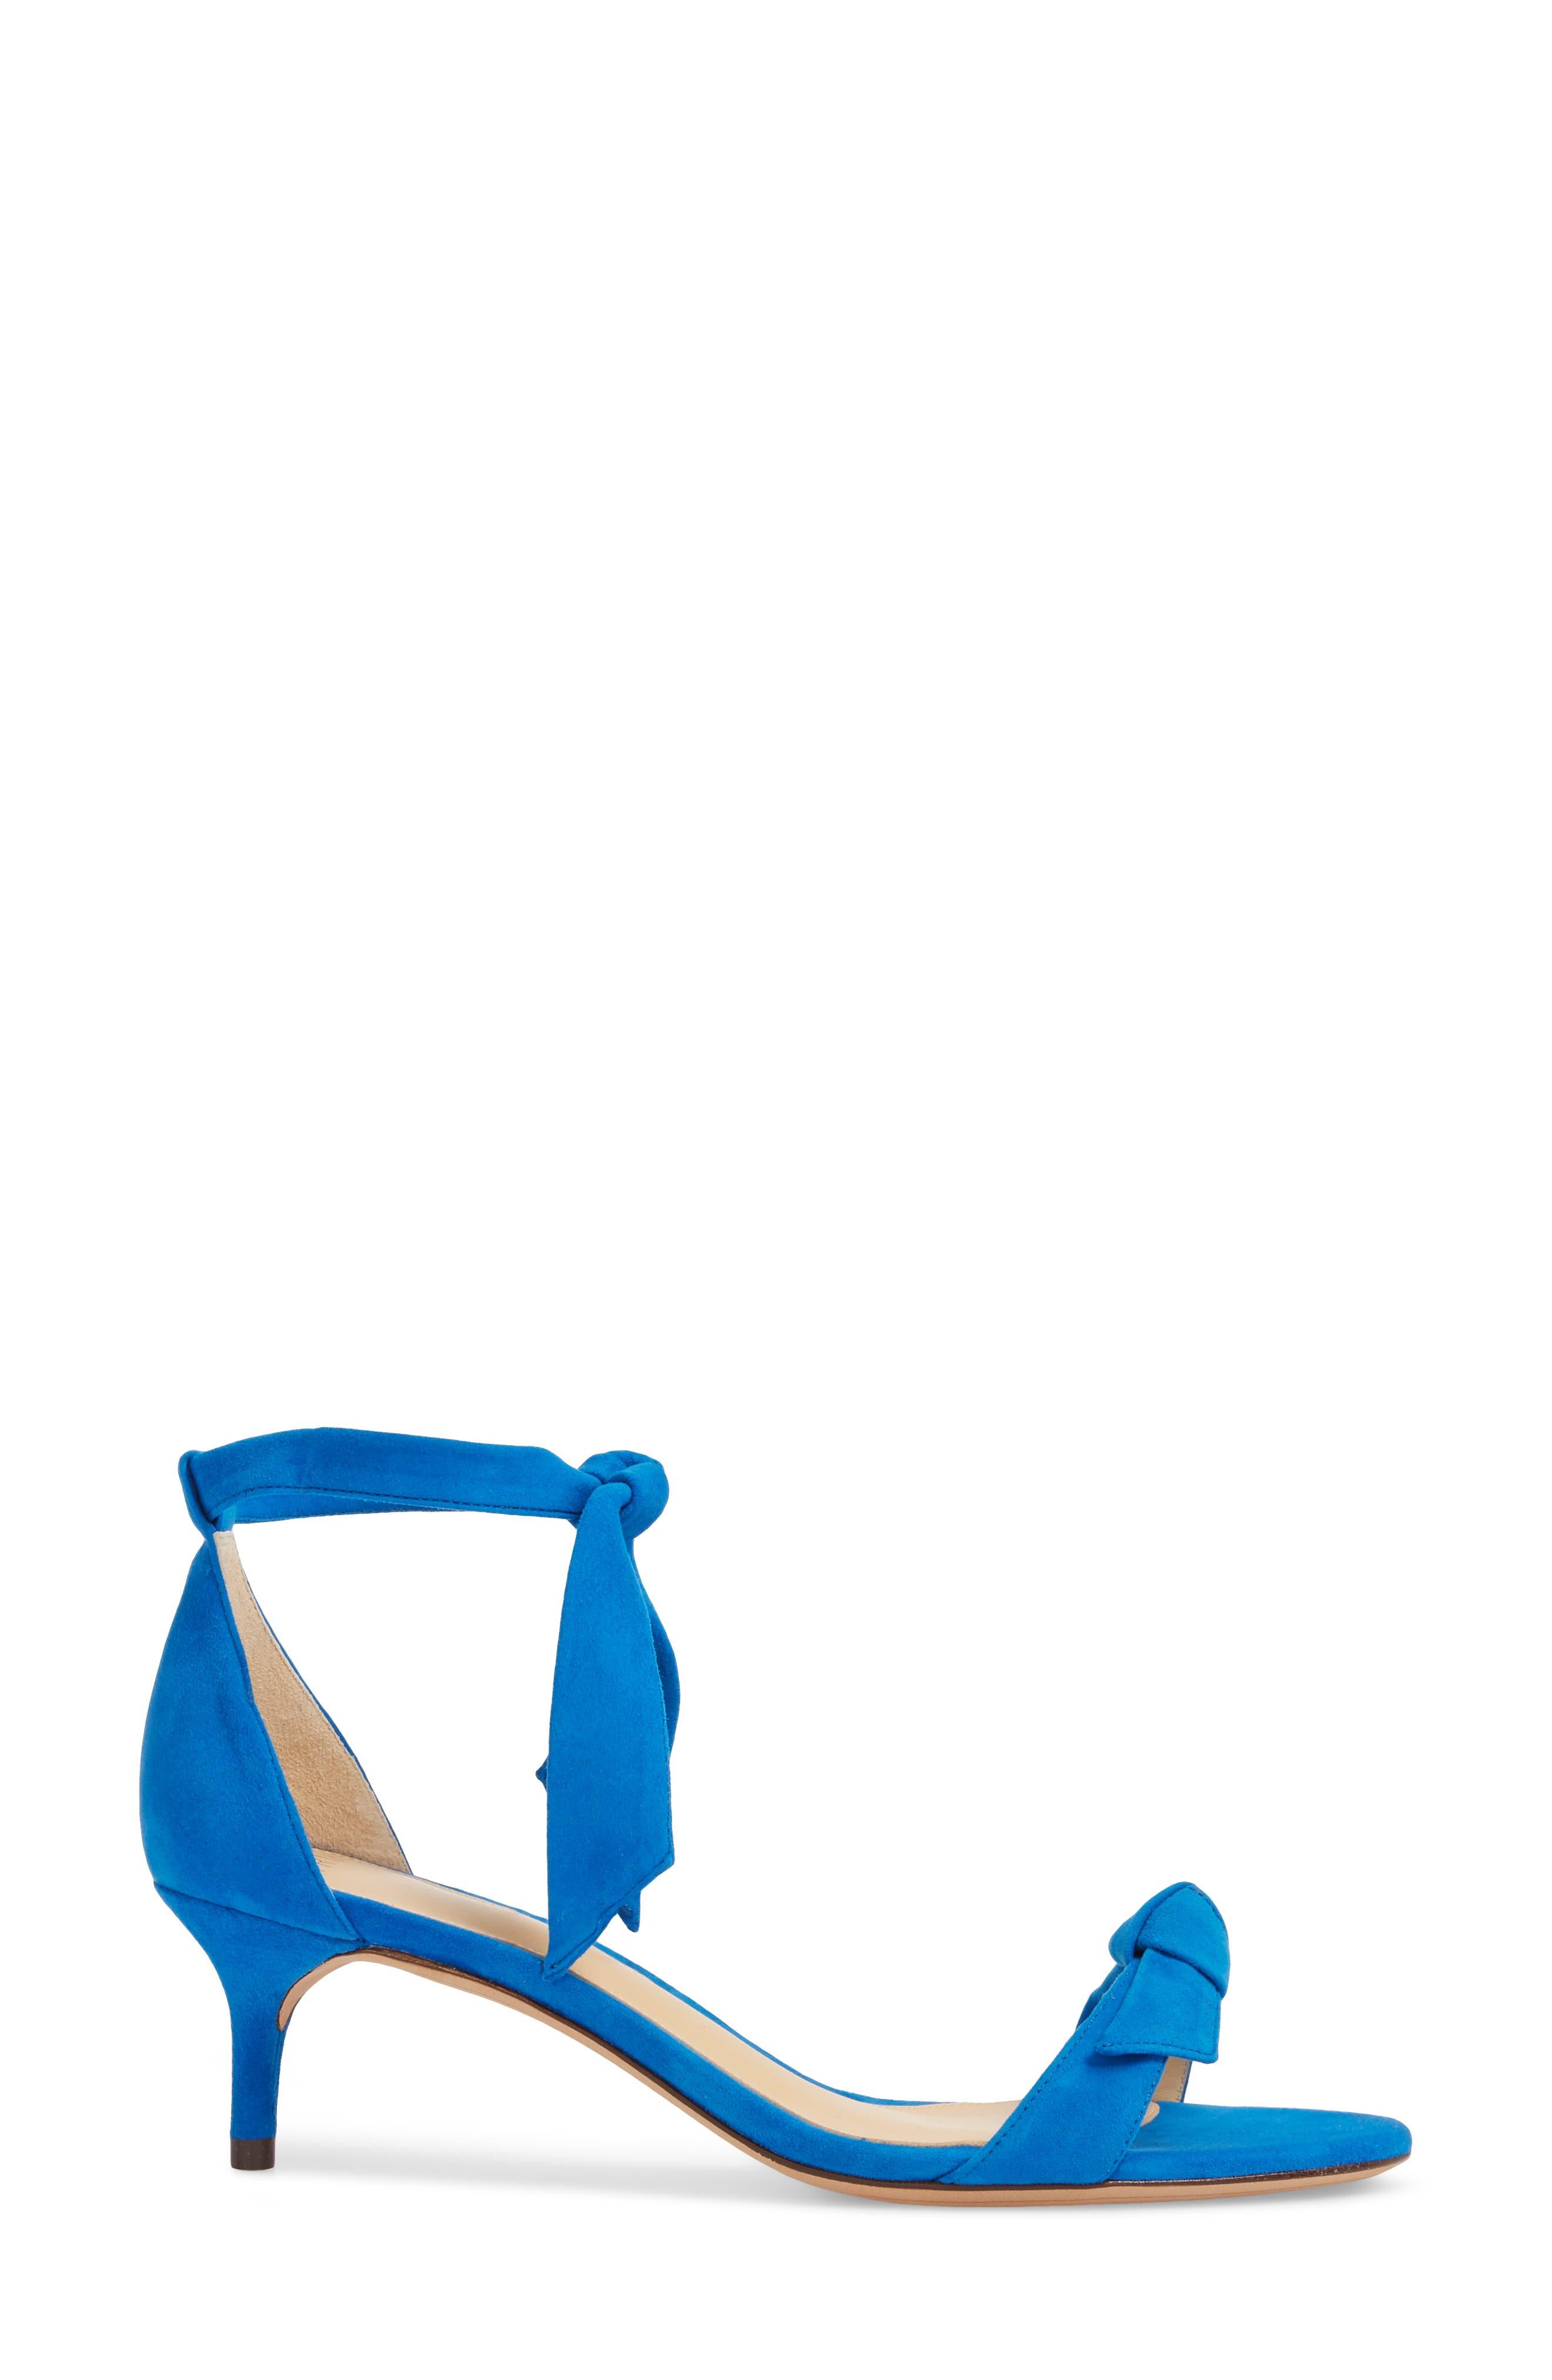 Alternate Image 3  - Alexandre Birman Clarita Knotted Sandal (Women)